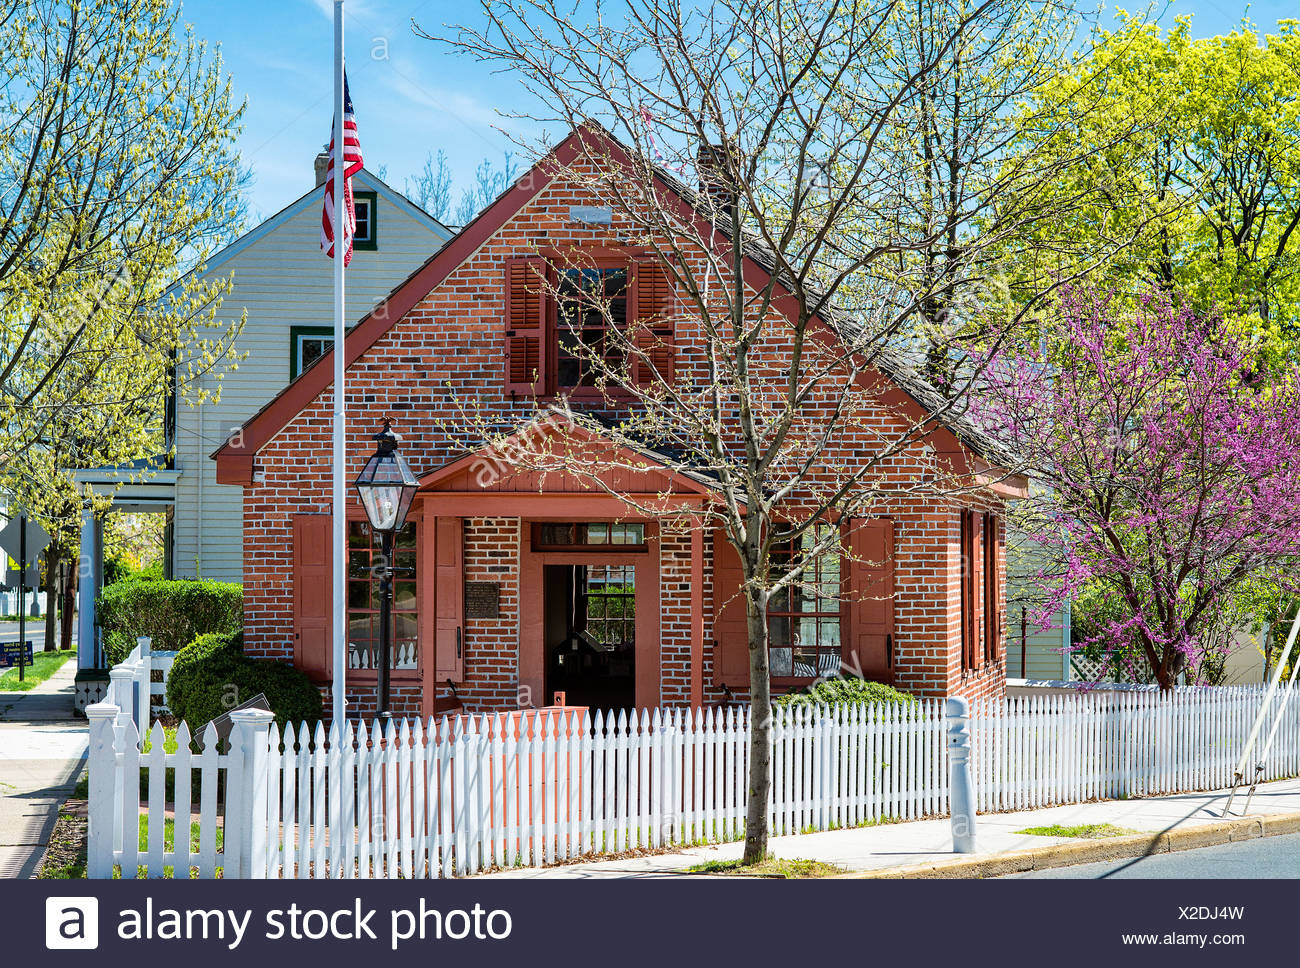 Clara Barton Schule, Bordentown, New Jersey, USA, Gründer des Amerikanischen Roten Kreuzes Stockbild